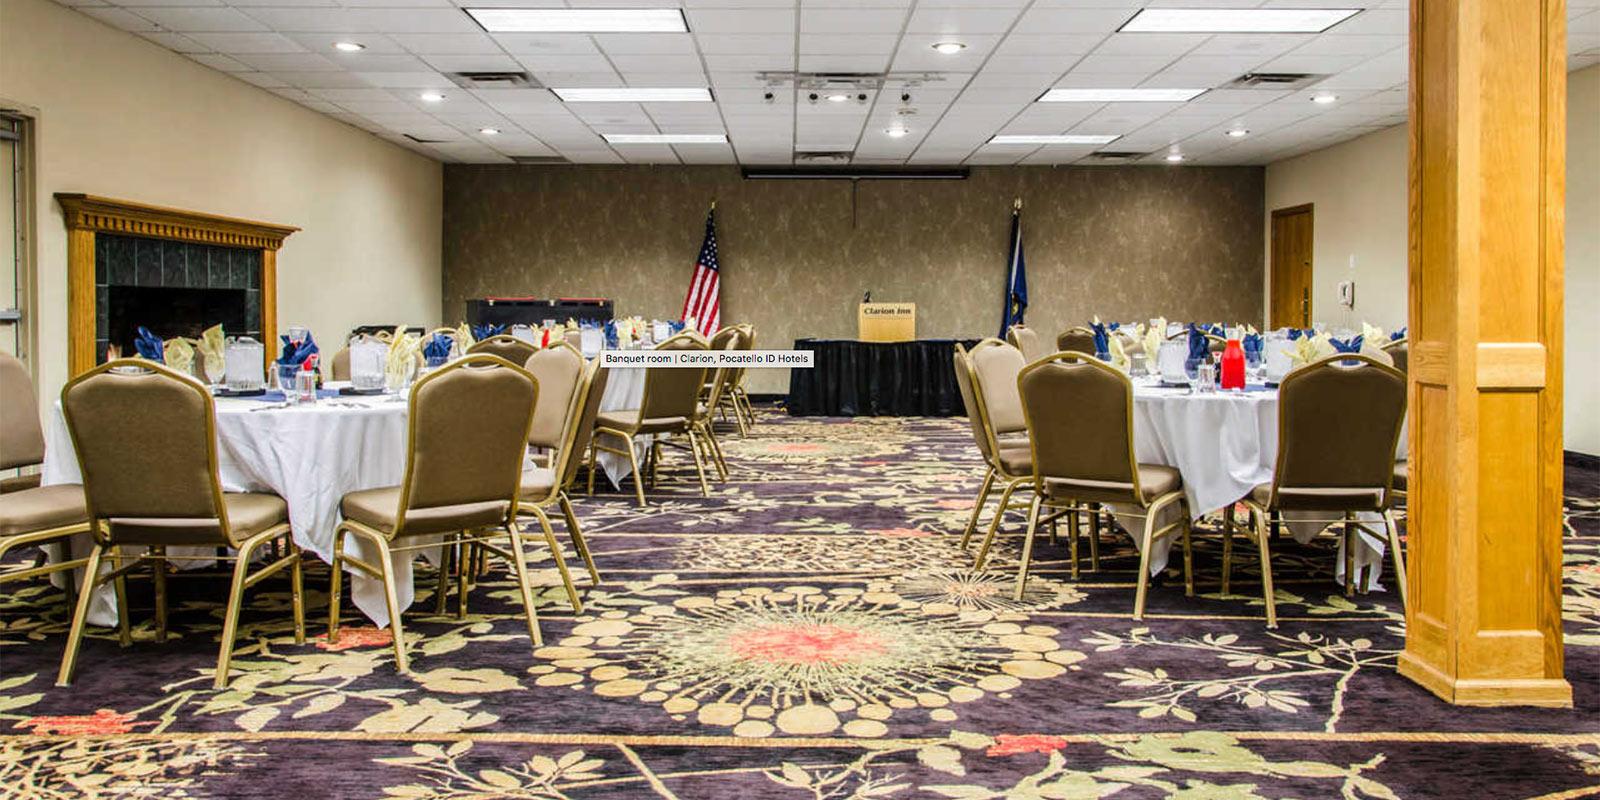 image: clarion inn pocatello banquet room